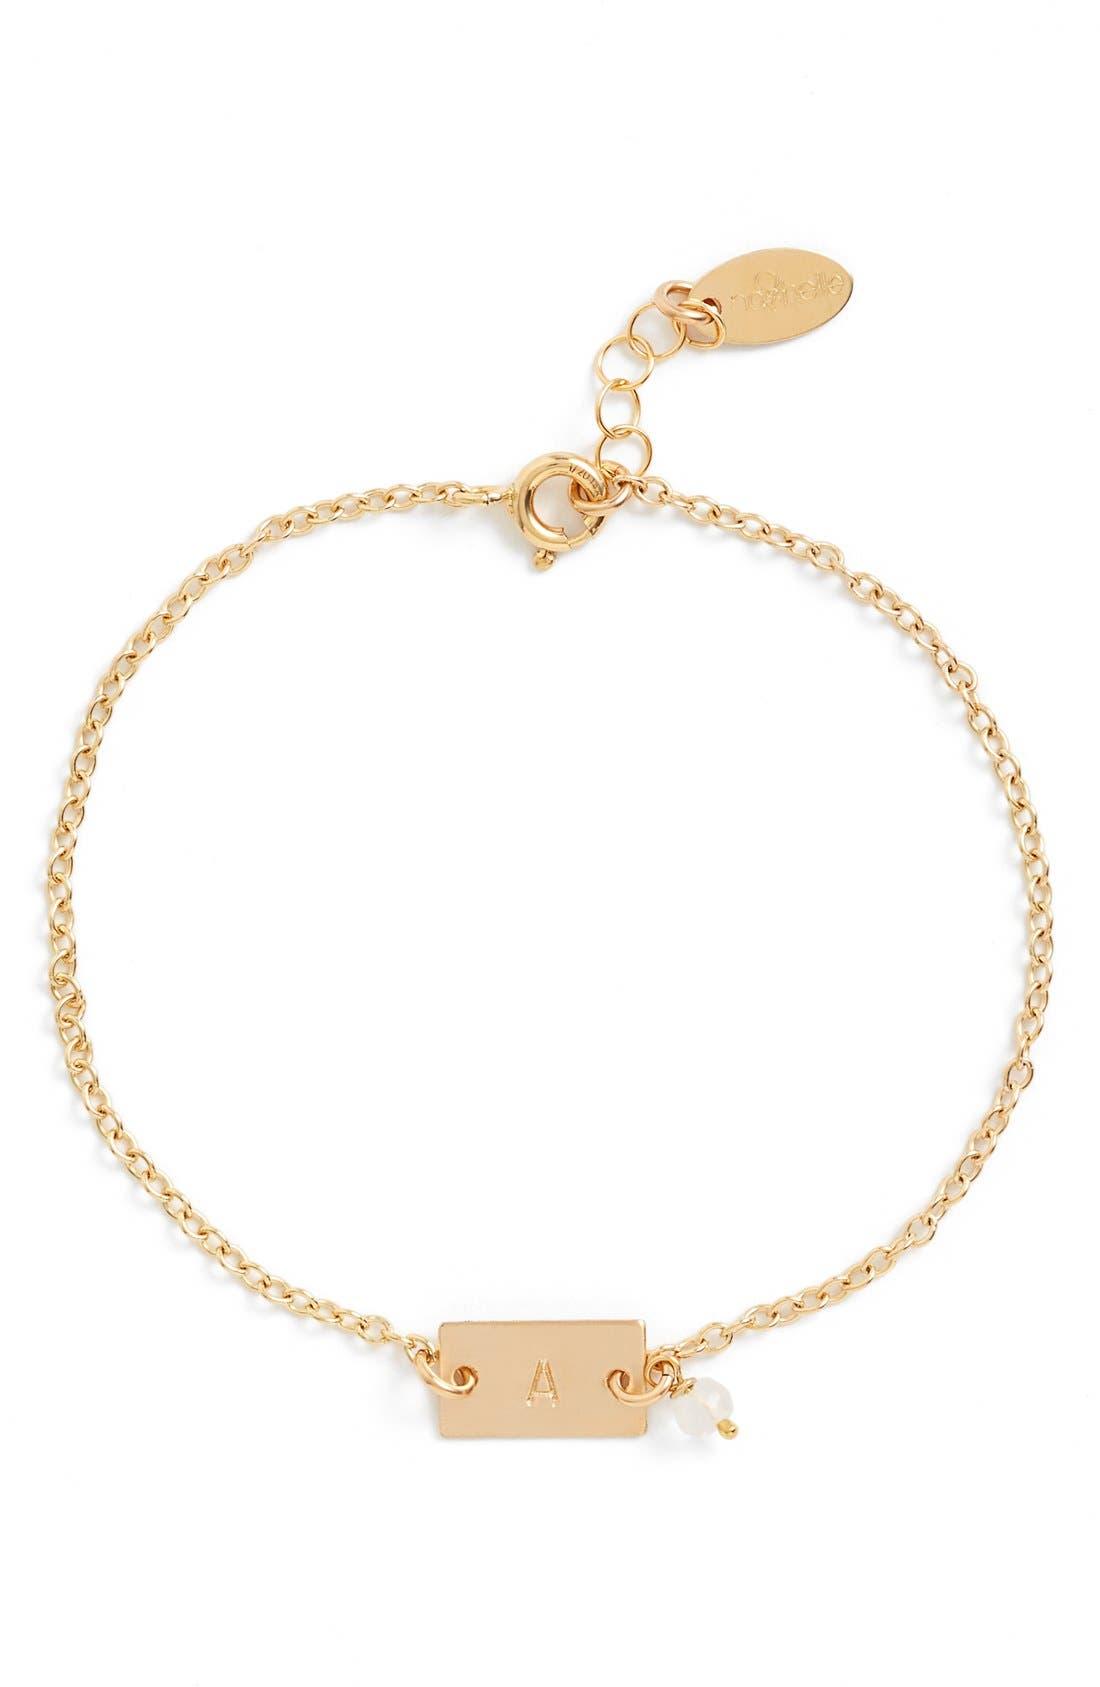 Shaka Initial 14k-Gold Fill Bar Bracelet,                             Main thumbnail 1, color,                             710